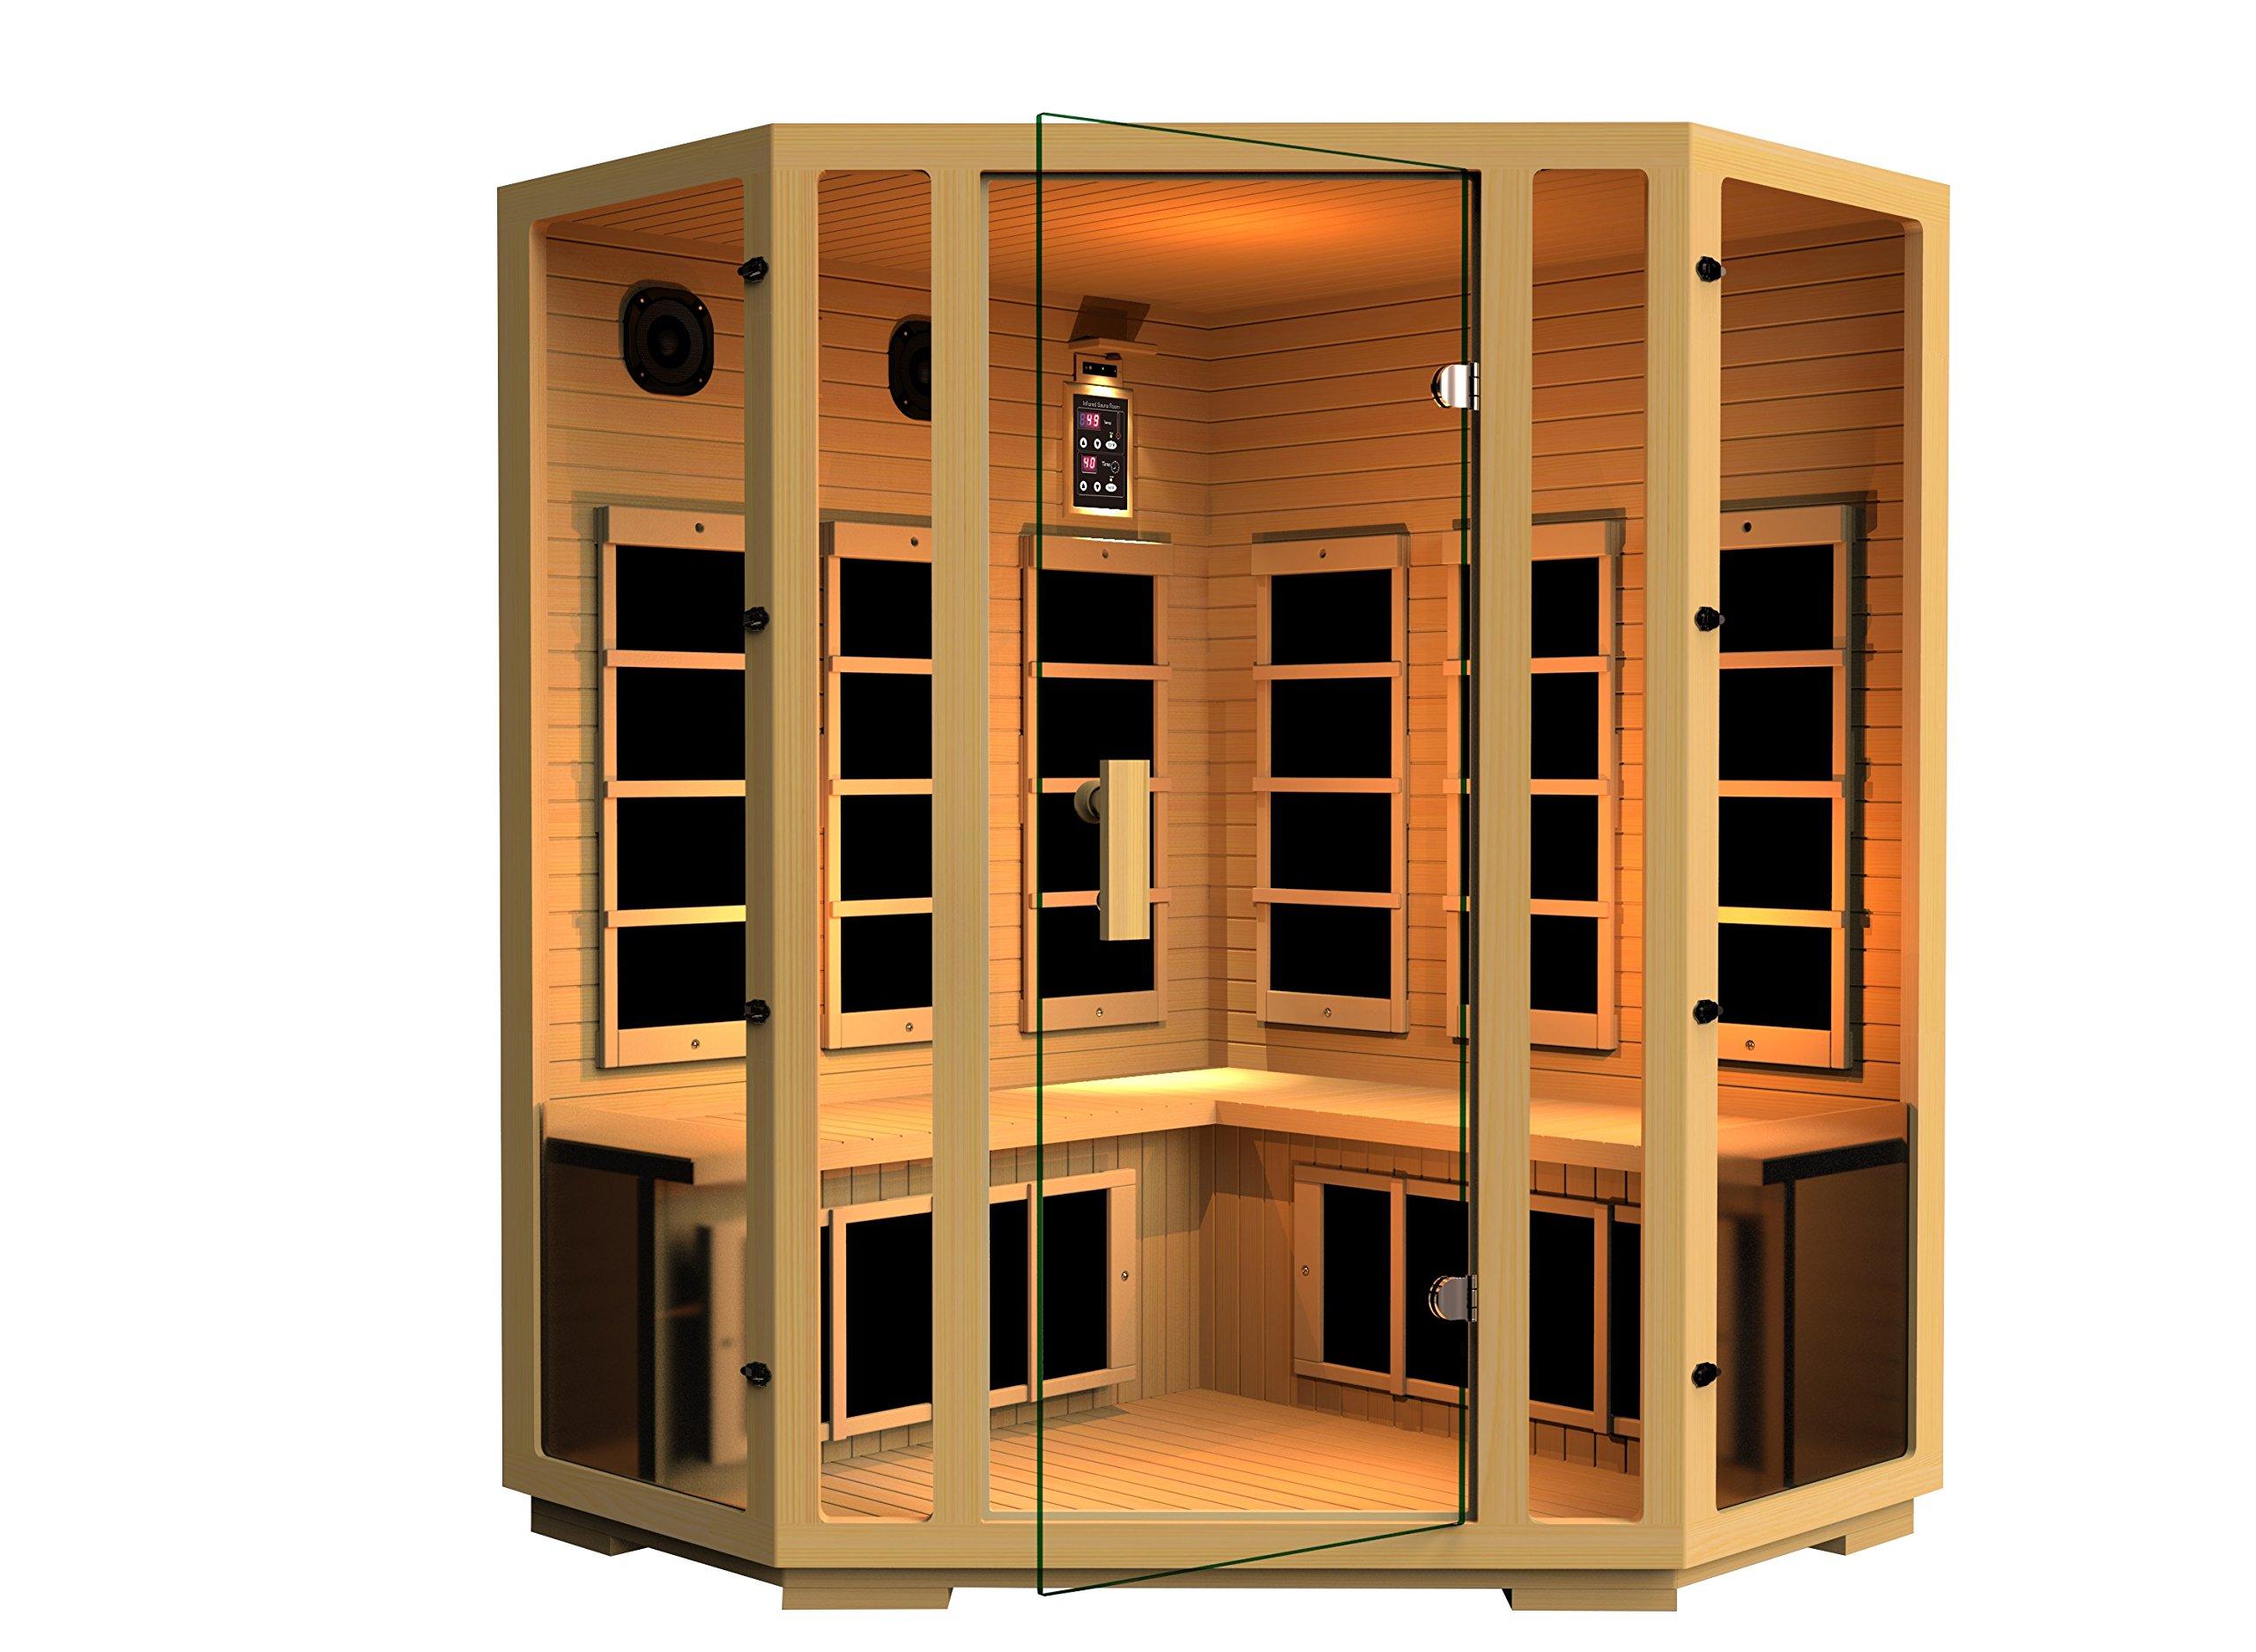 JNH Lifestyles Joyous Corner Far Infrared Sauna 8 Carbon Fiber Heaters 5 Year Warranty